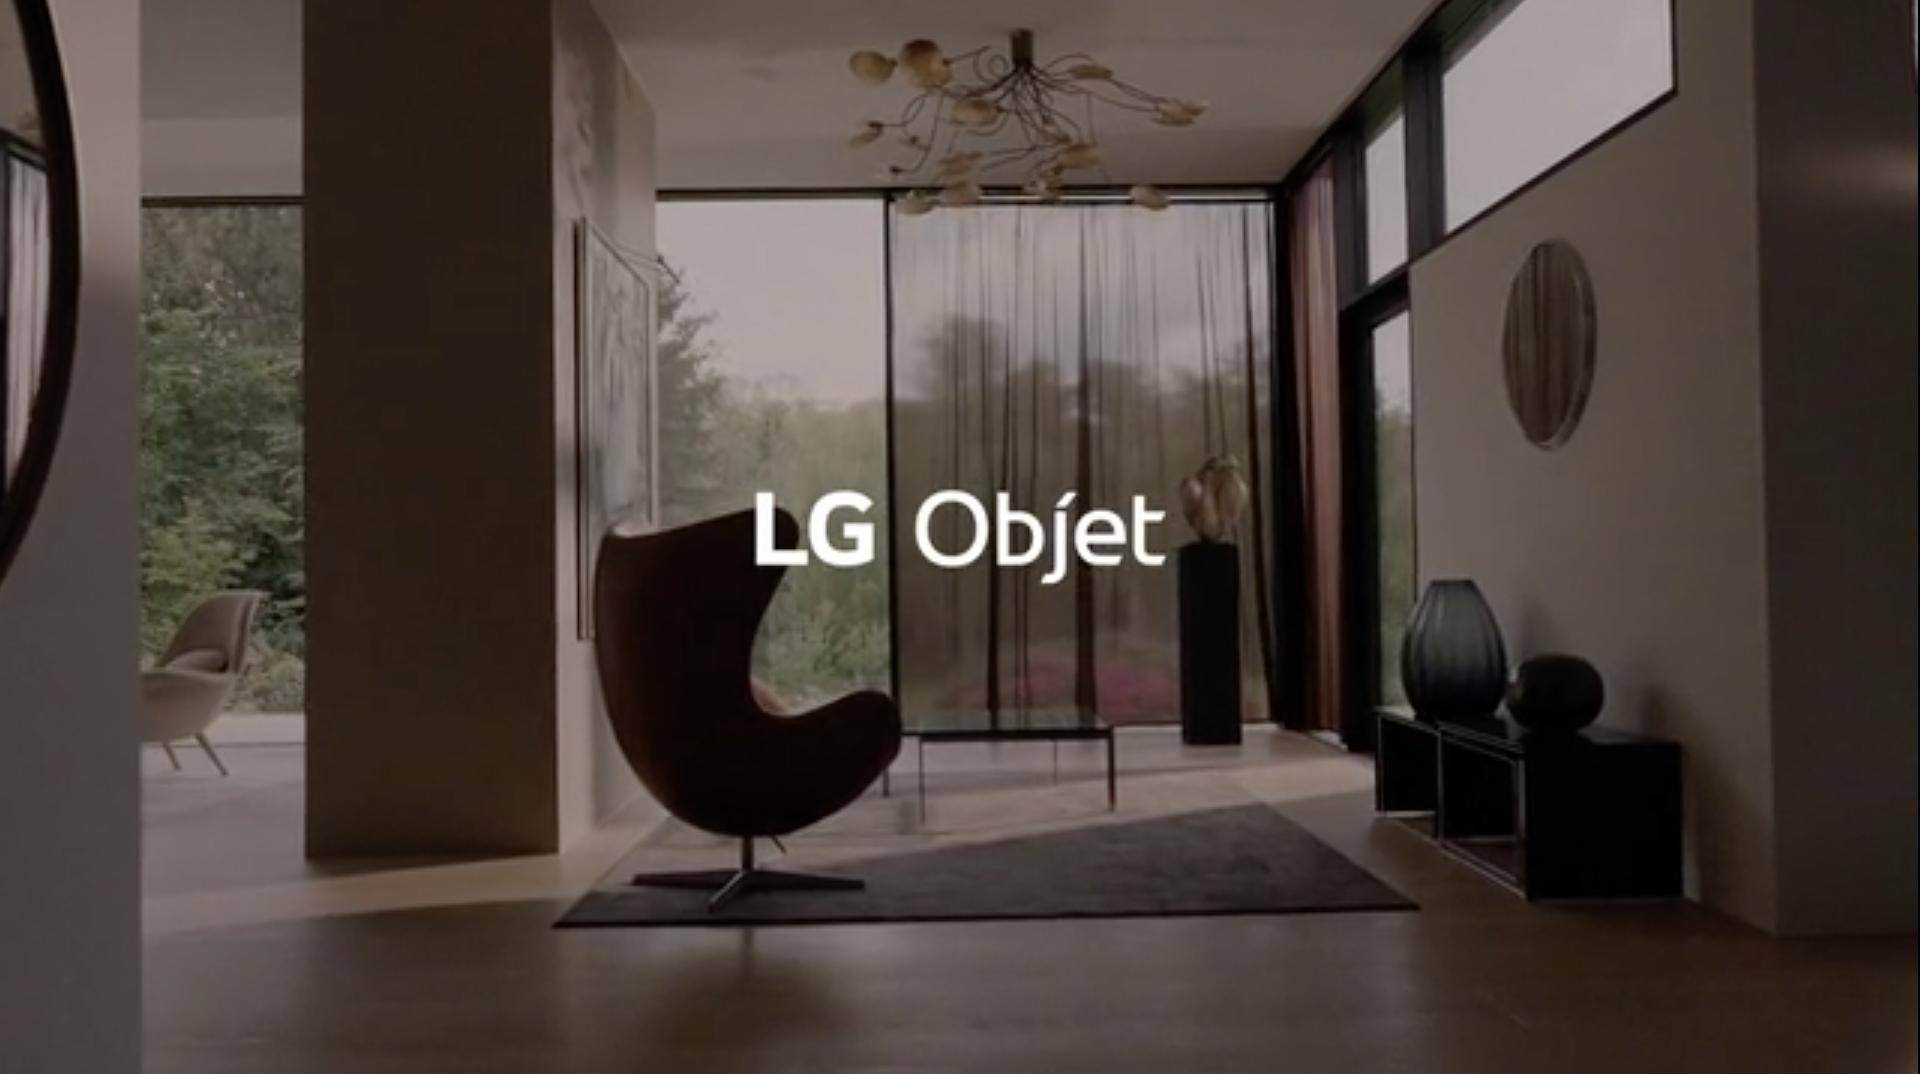 LG Objet 2019 - Lifestyle